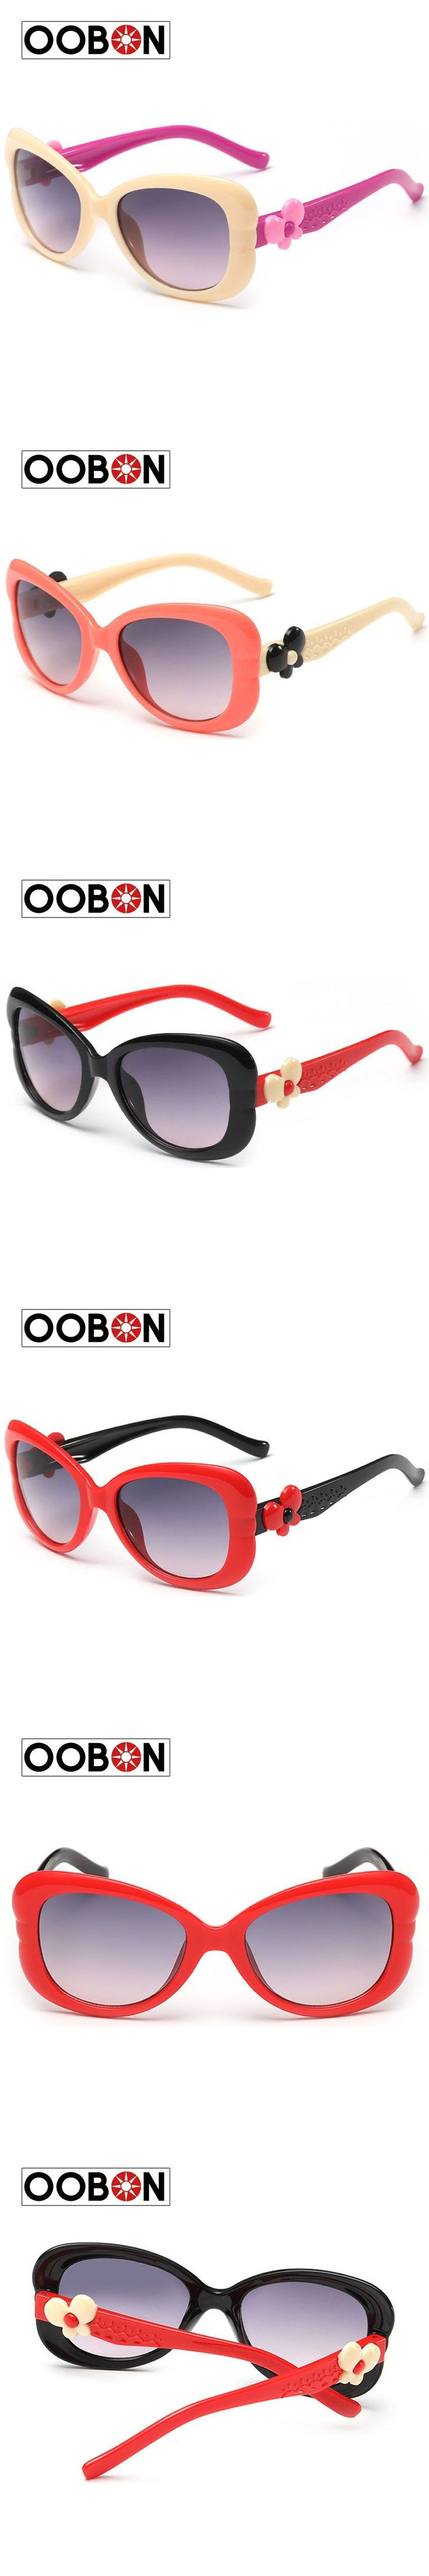 Oobon Rushed Adult 2016 Multicolor Frame Cute Cool Kids Sunglasses Uv400 Original Oculos Infantil New Sun Glasses Eyewear Boy